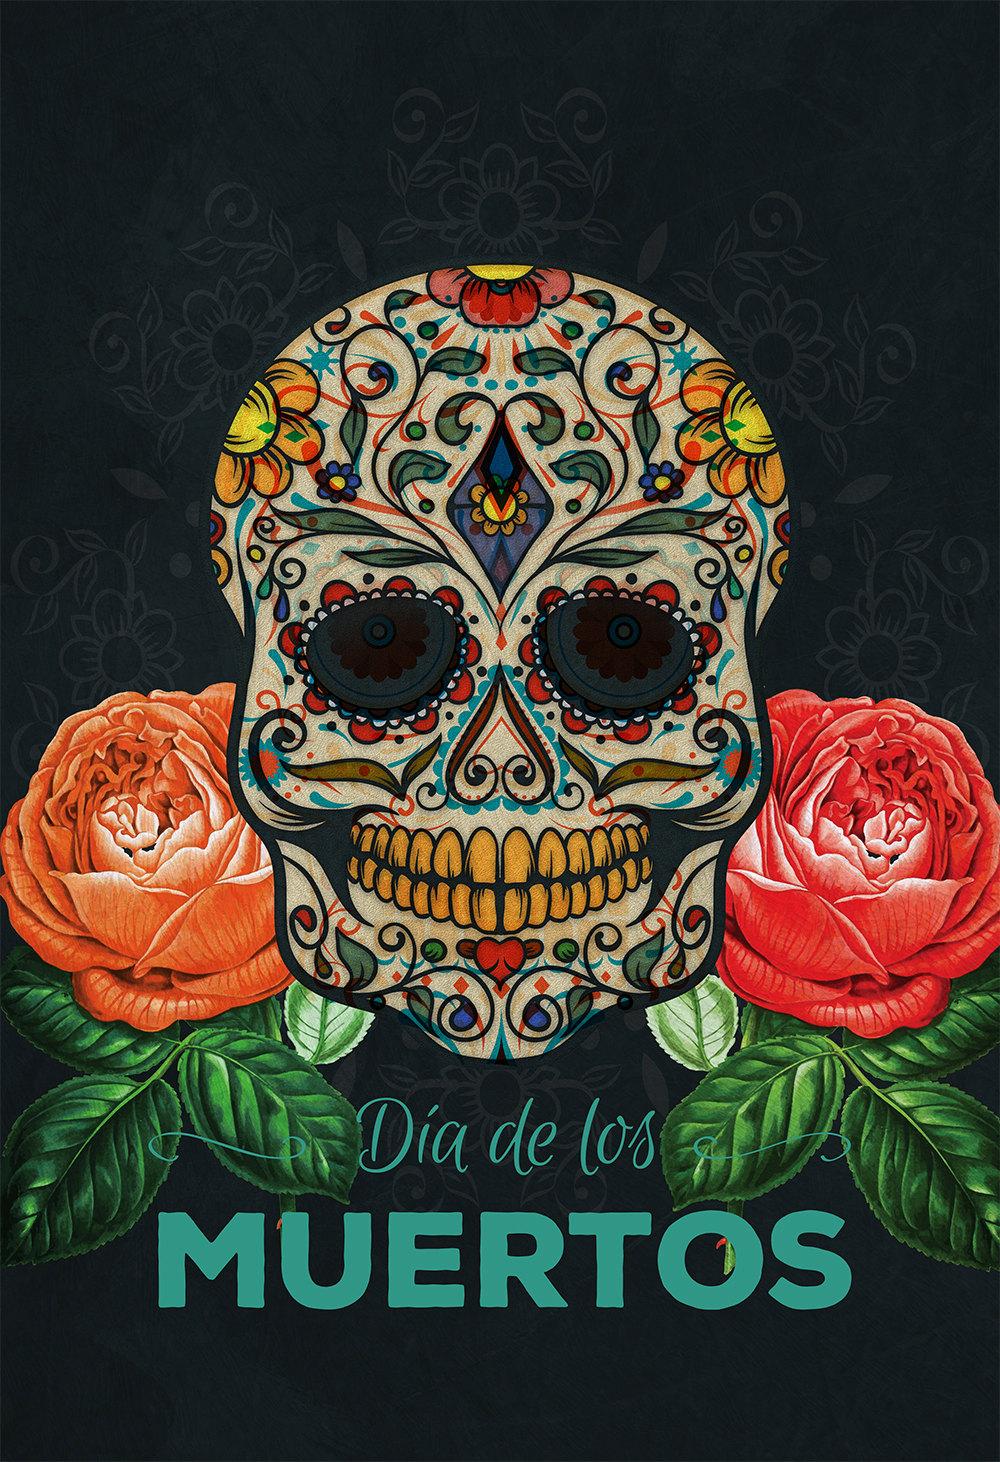 dia de los muertos mexican retro sugar skull illustration art print